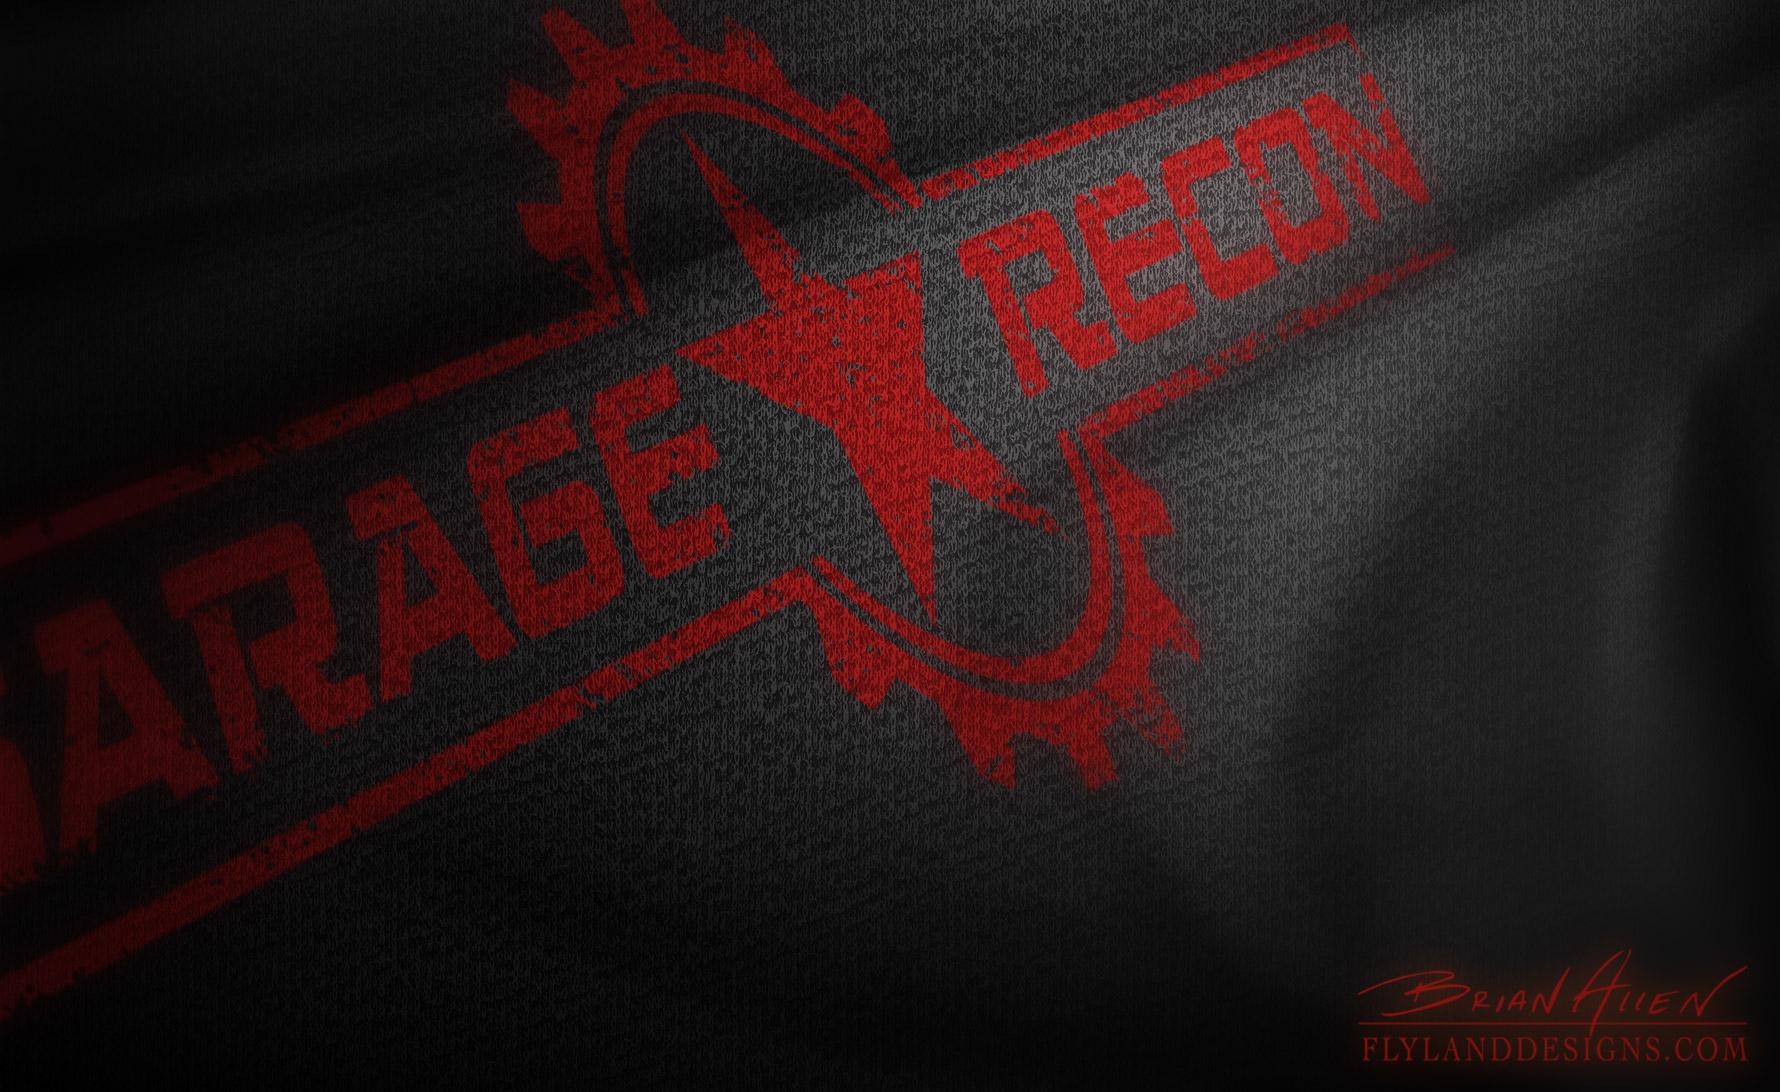 Garage Recon Logo Design - Flyland Designs, Freelance Illustration ...